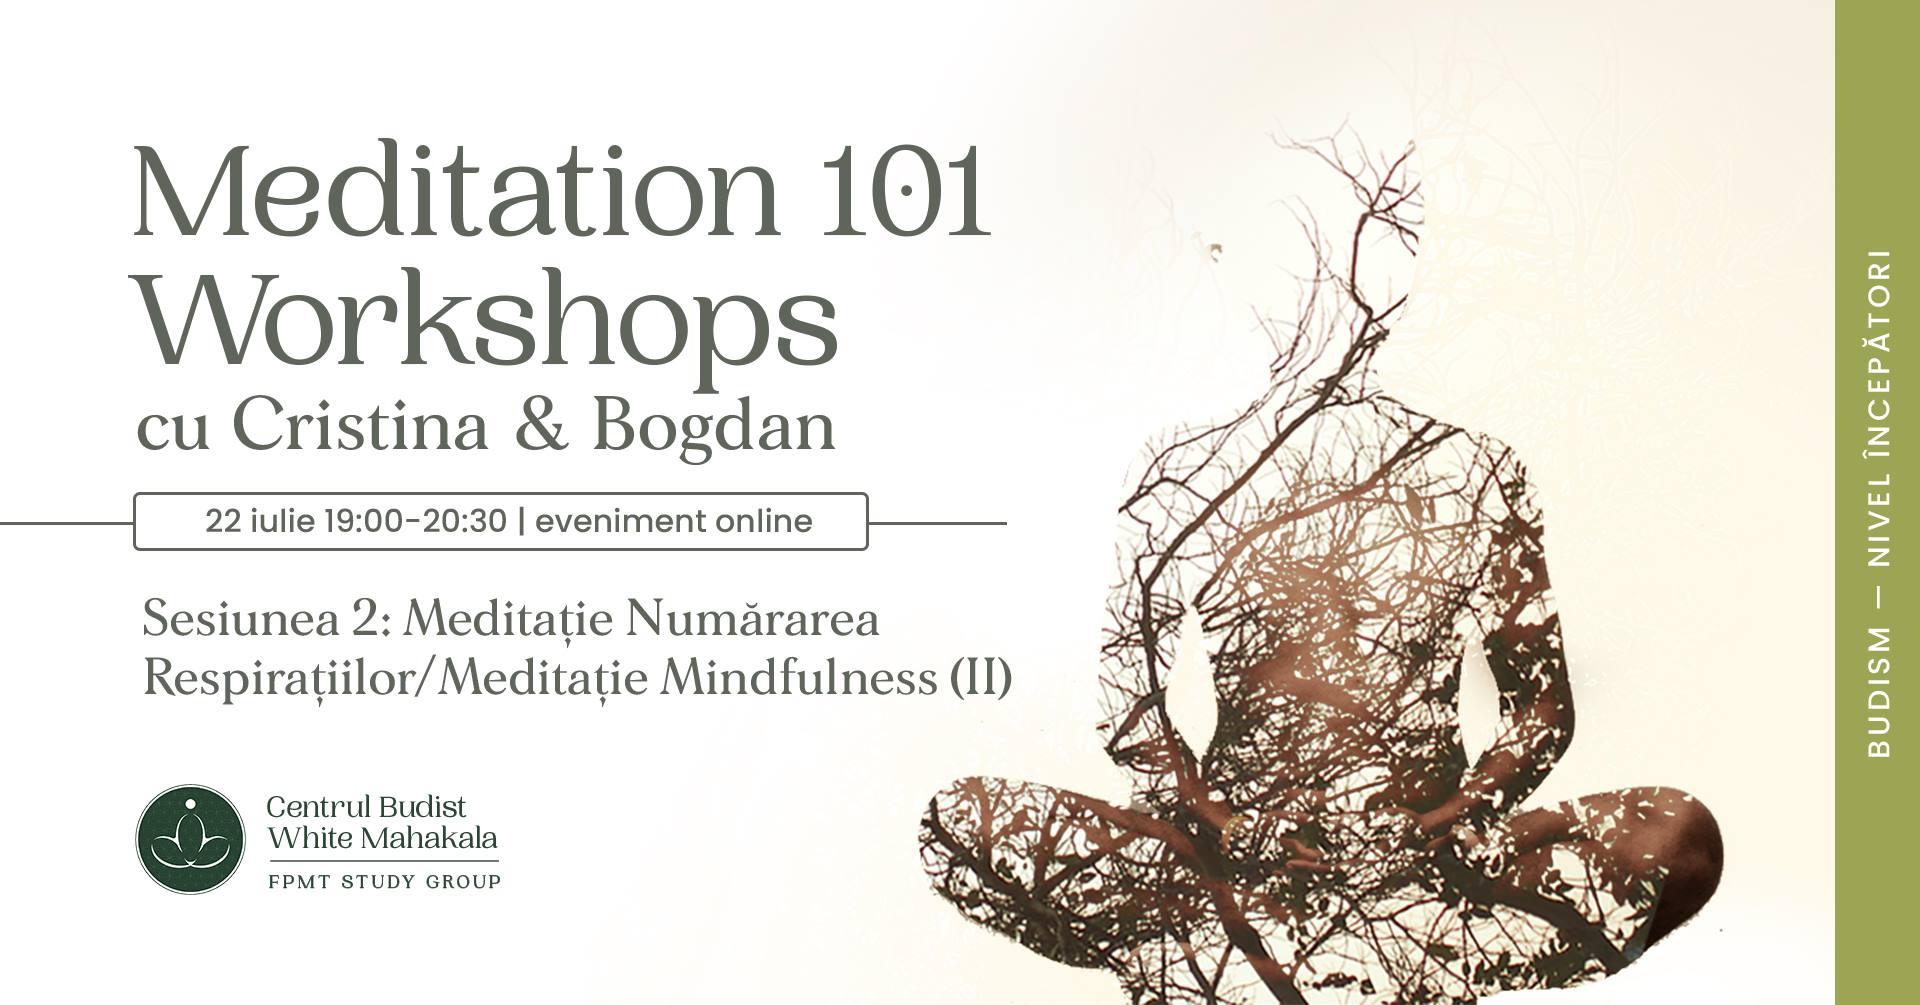 MEDITATION 101- Workshops Sesiunea 1: Meditatie Numararea Respiratiilor/Meditatie Mindfulness (II)